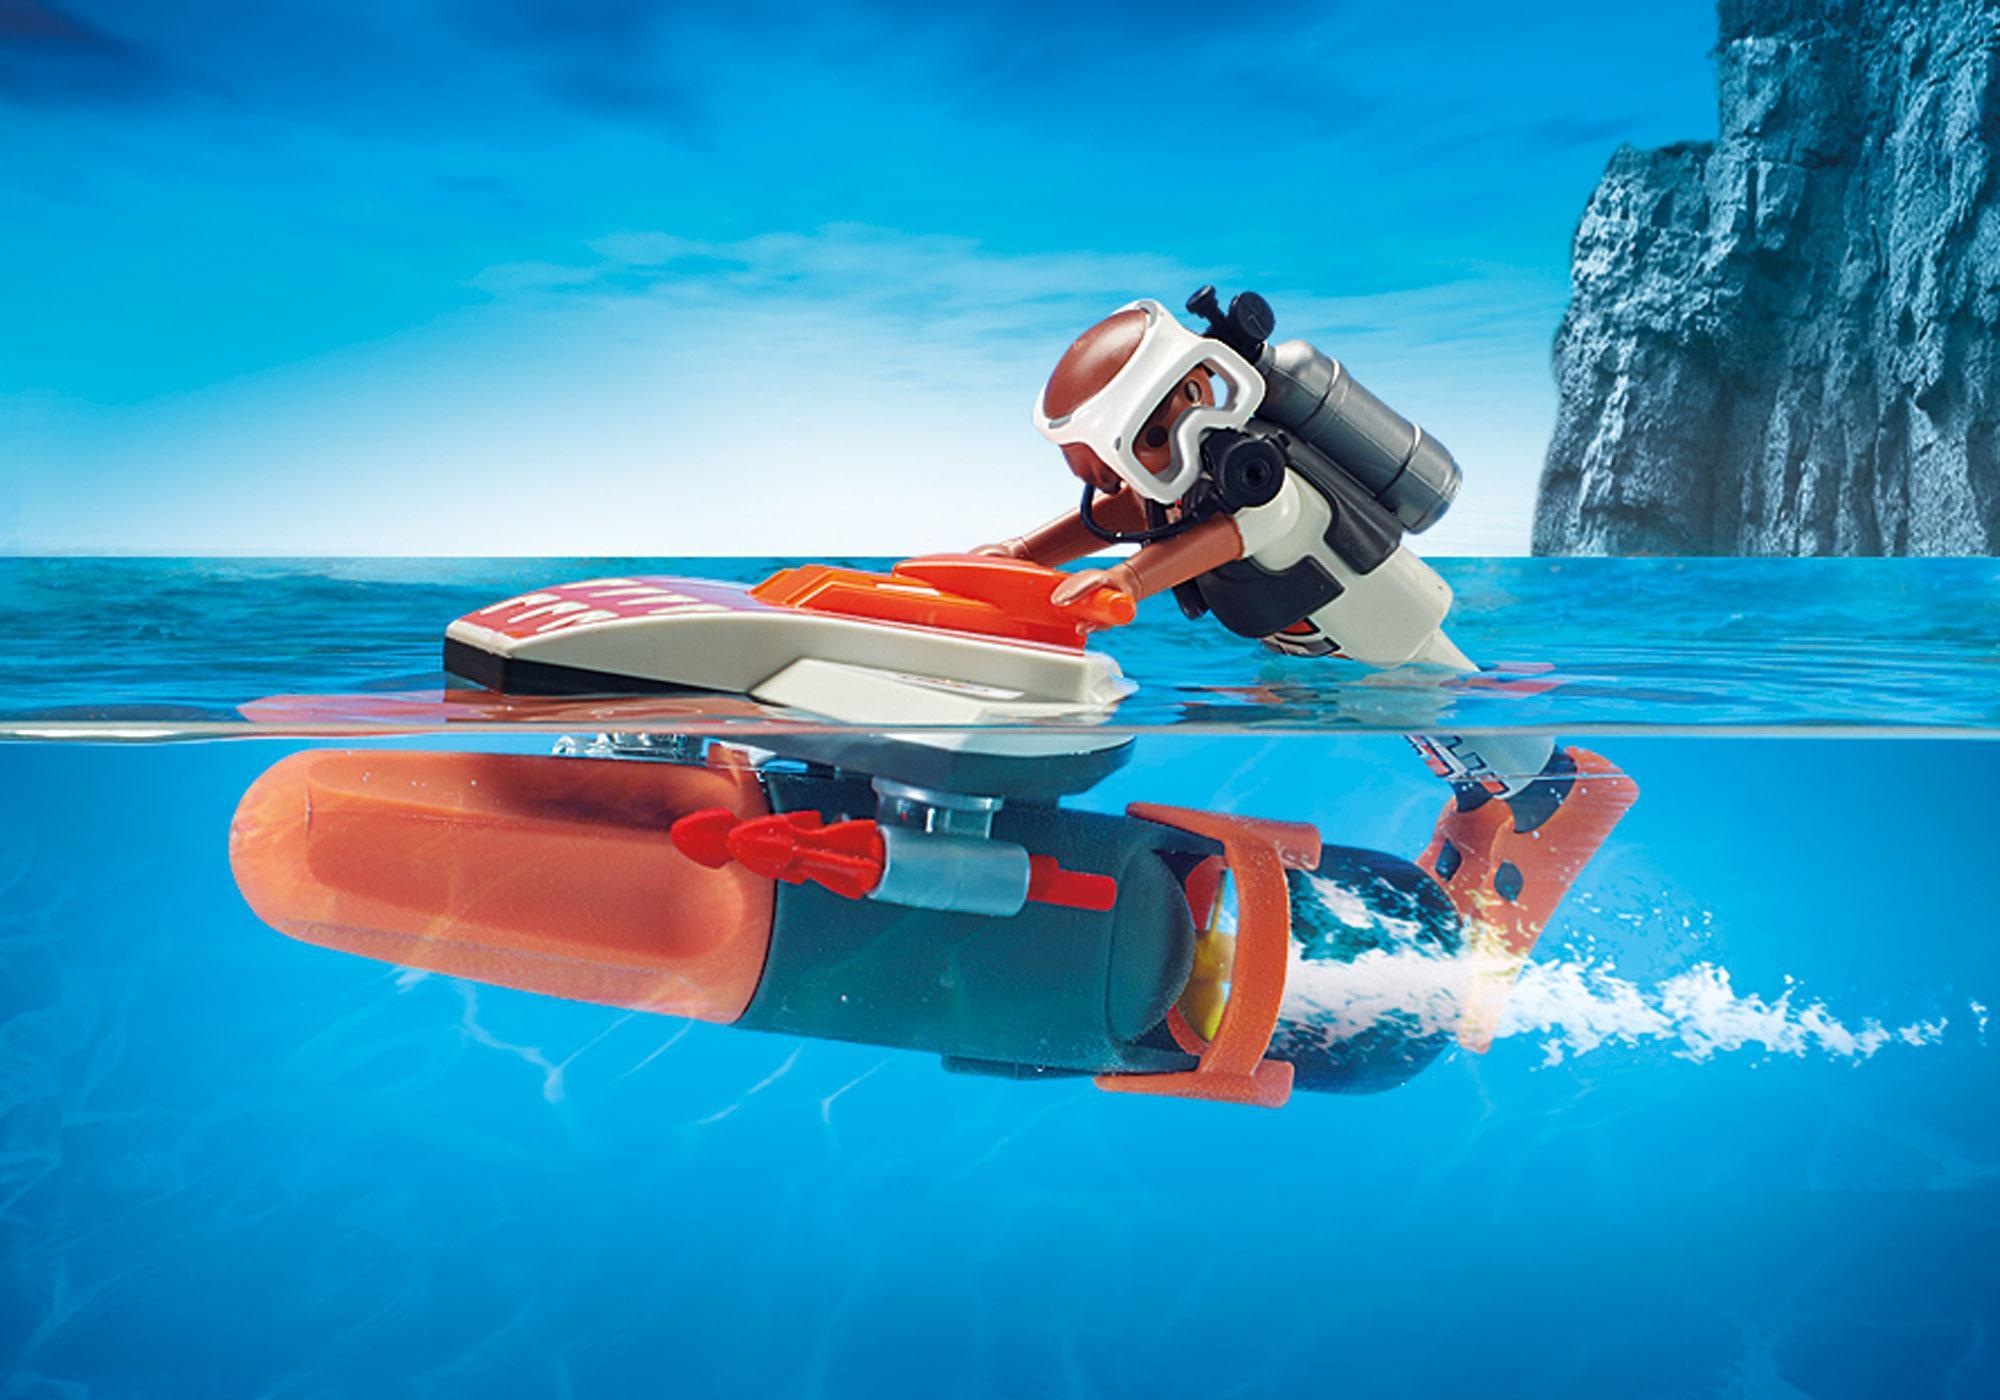 http://media.playmobil.com/i/playmobil/70004_product_extra2/SPY TEAM Underwater Wing